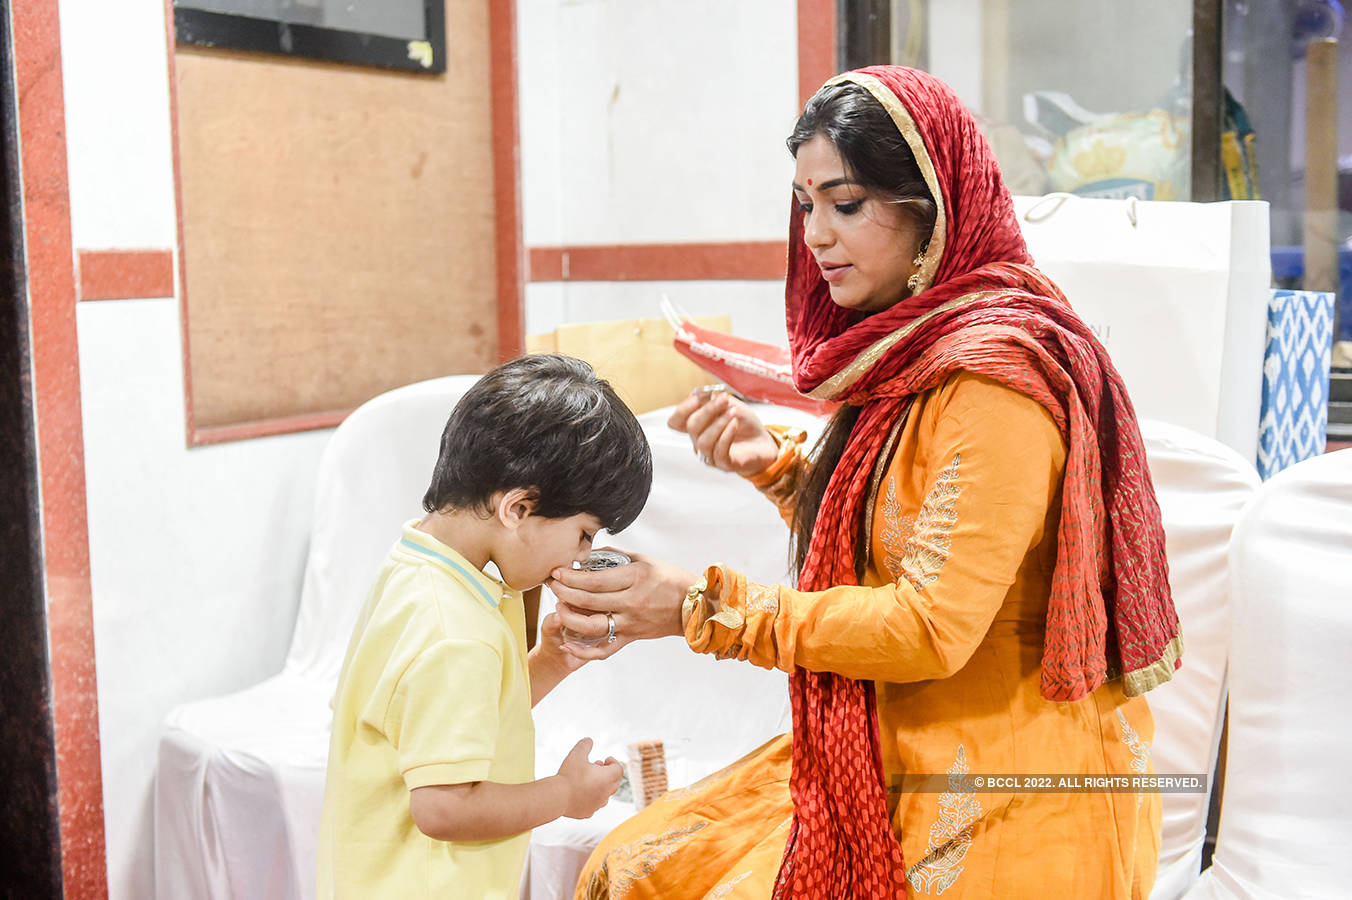 Rajesh Khattar and Vandana Sajnani Khattar's 10th wedding anniversary